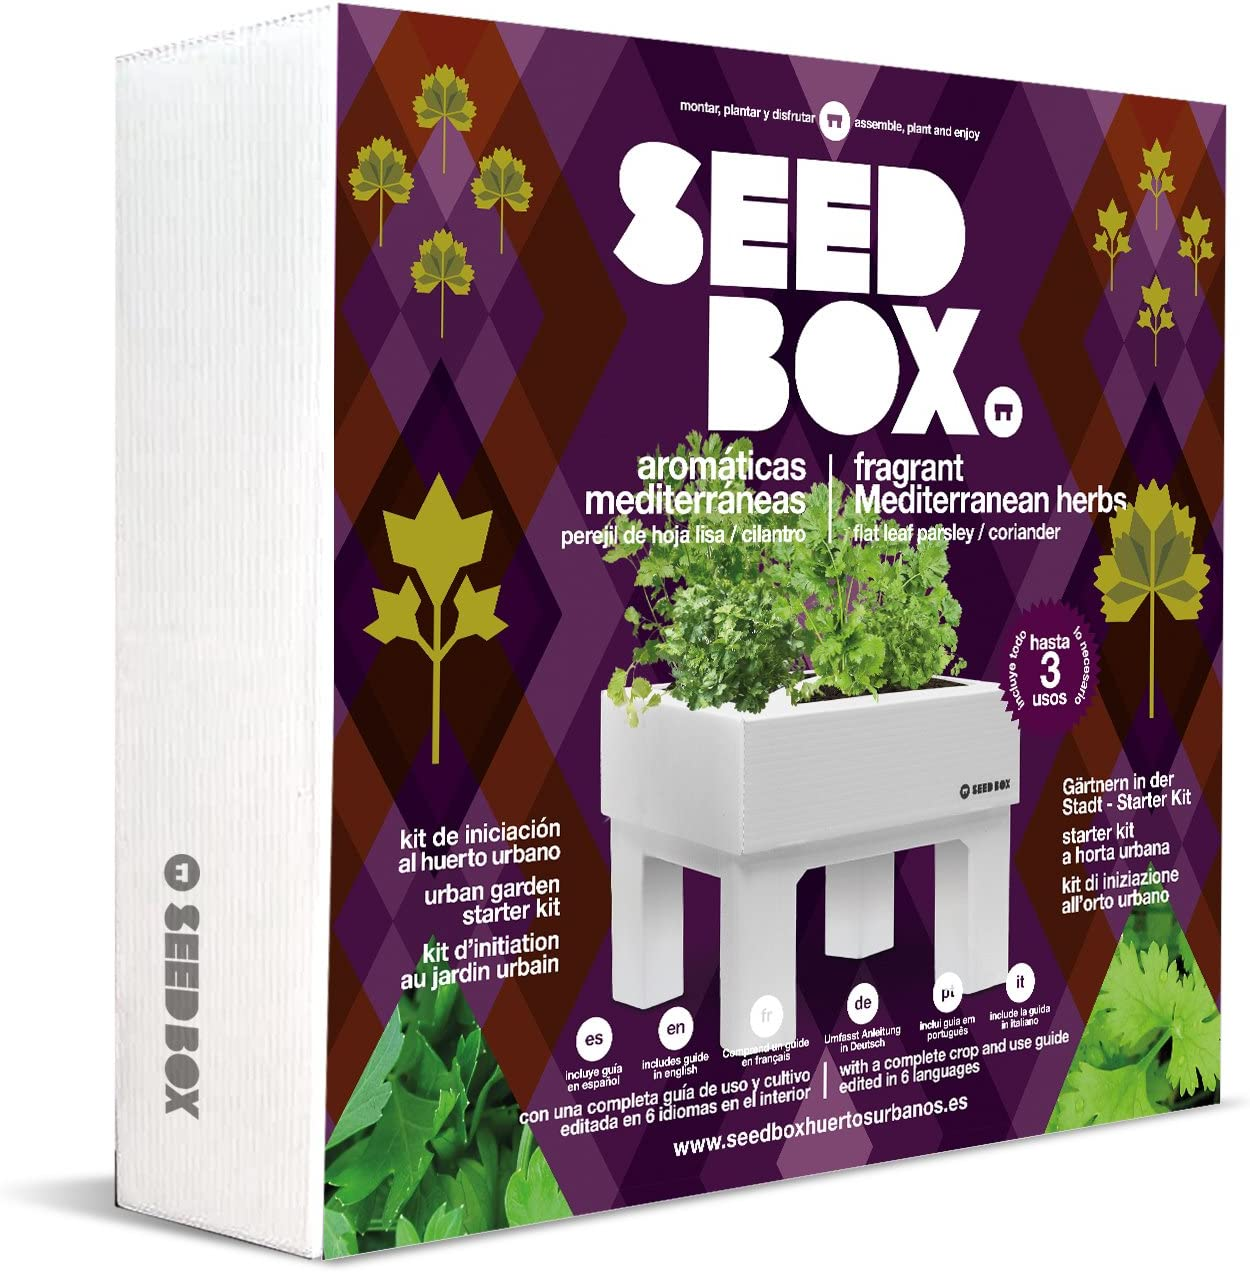 SeedBox Seed Box SBCOAM - Aromáticas mediterráneas